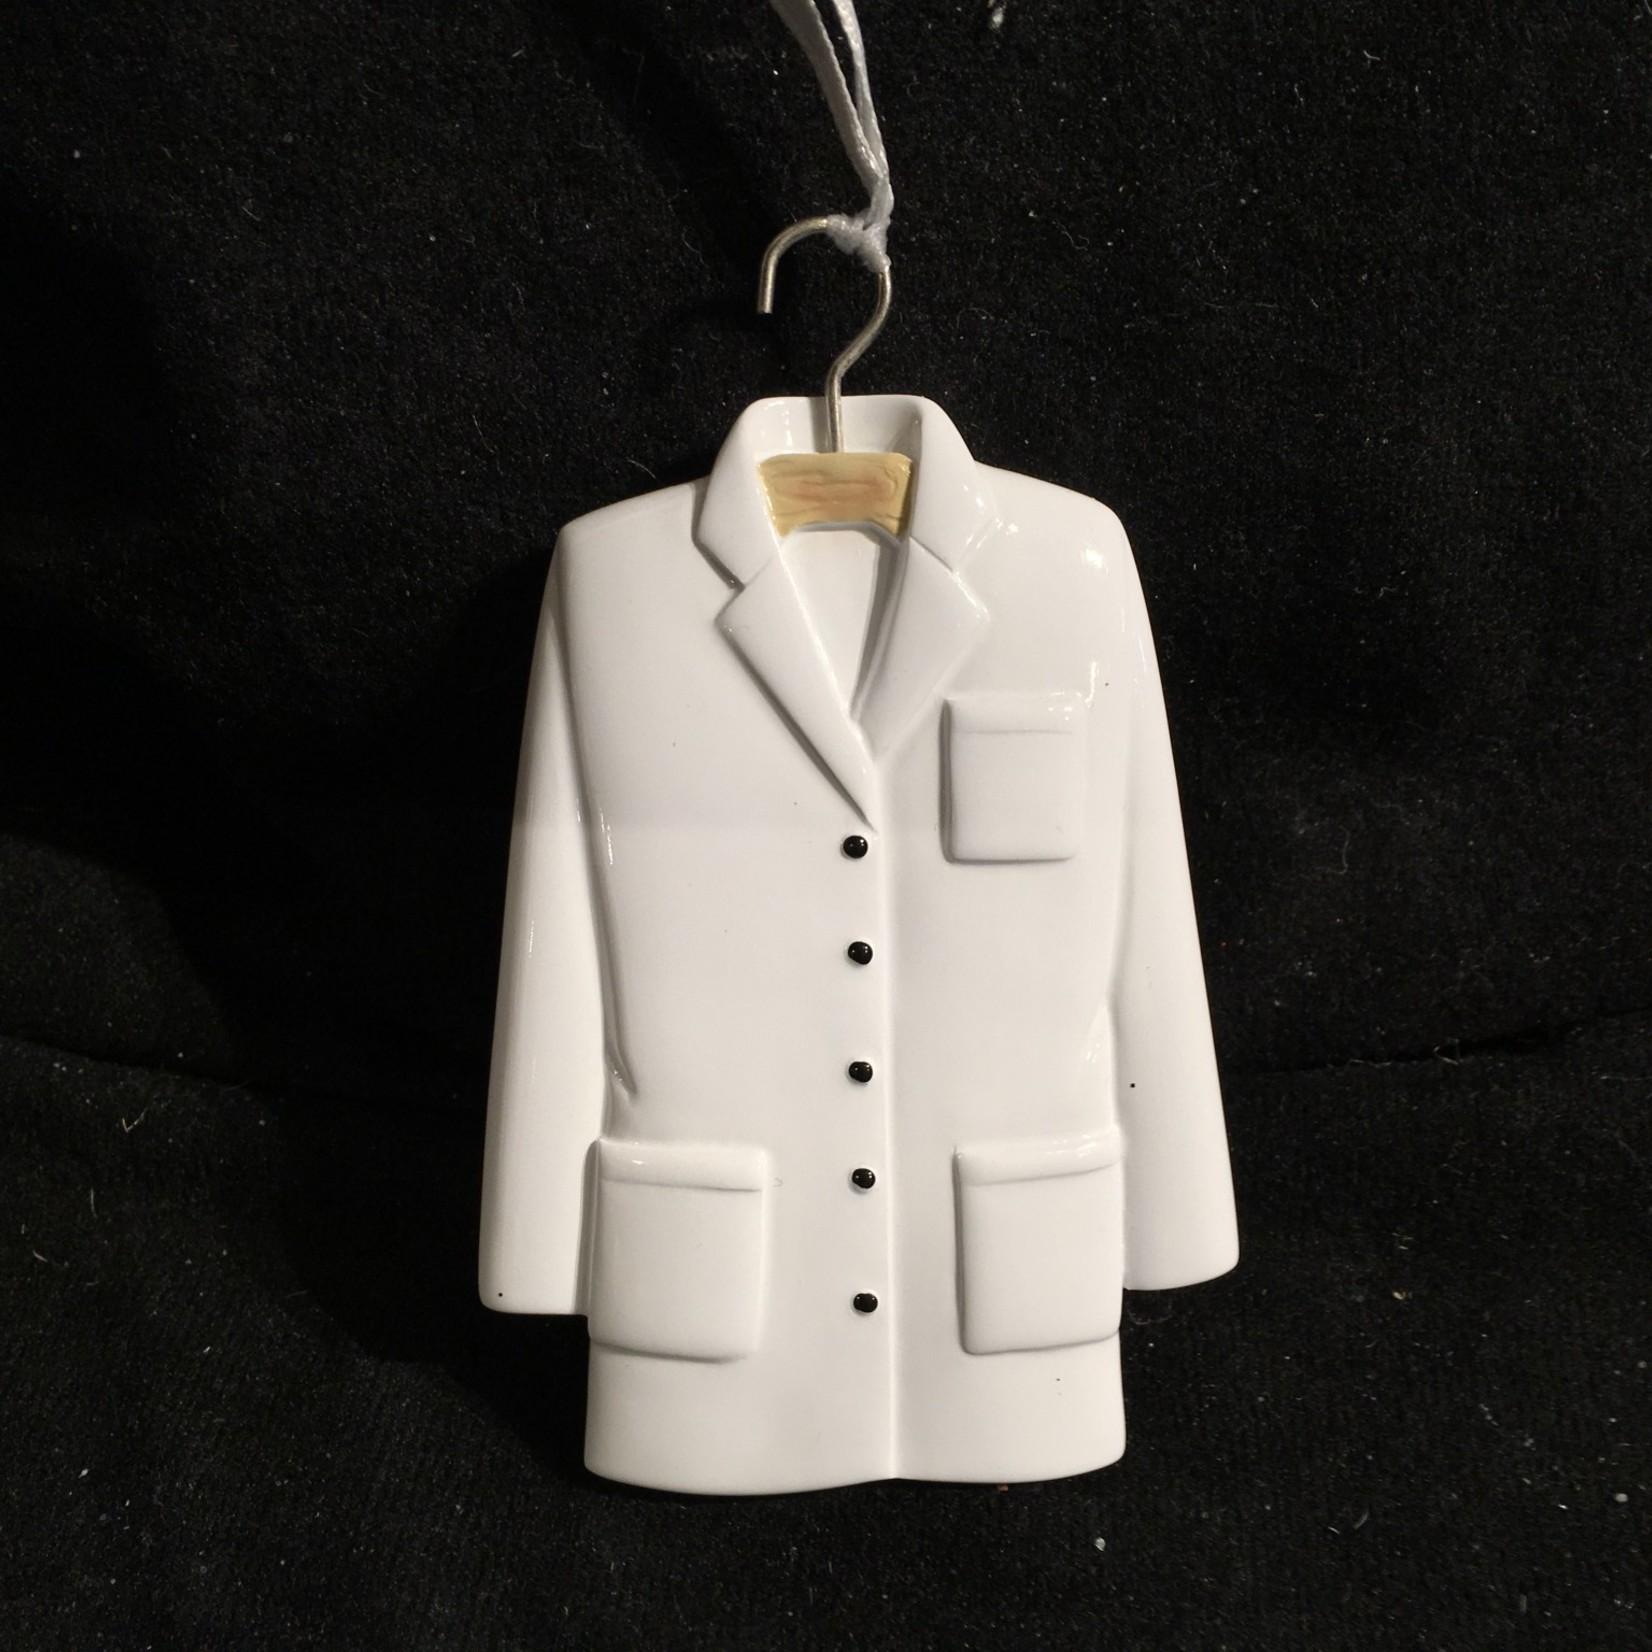 White Lab Coat Orn